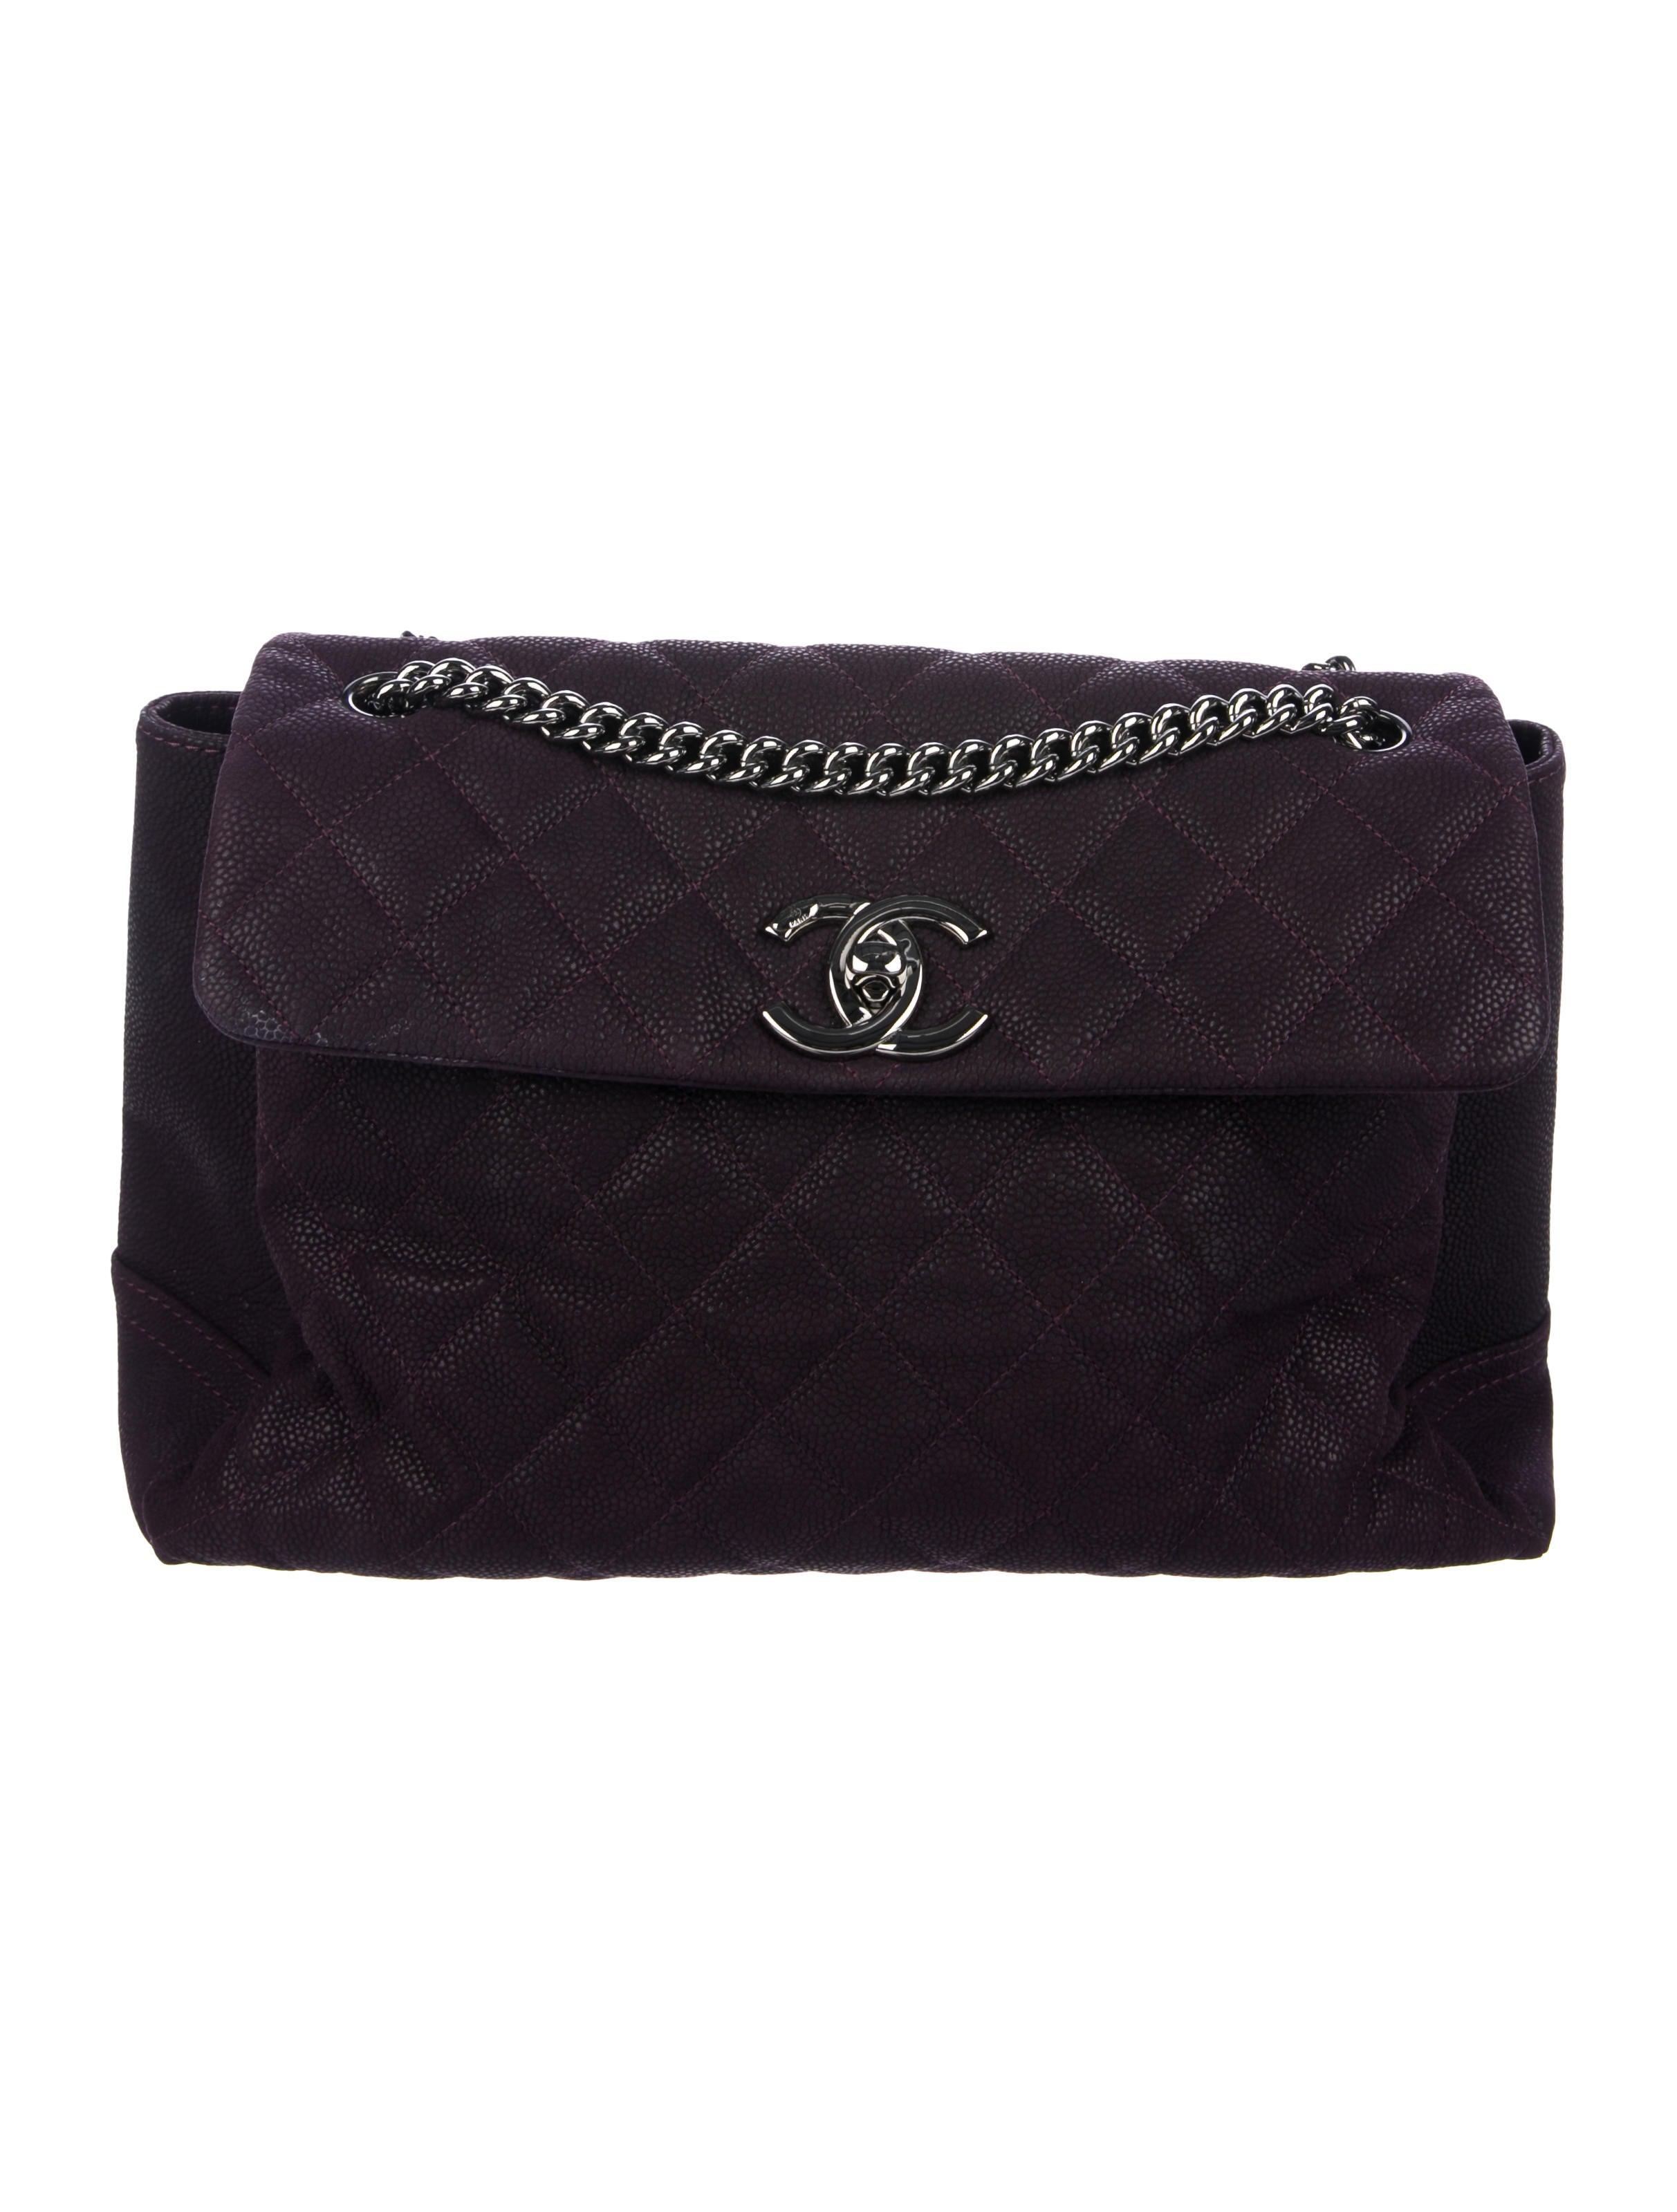 543eeb81267c Chanel Lady Pearly Flap Bag - Handbags - CHA262118 | The RealReal